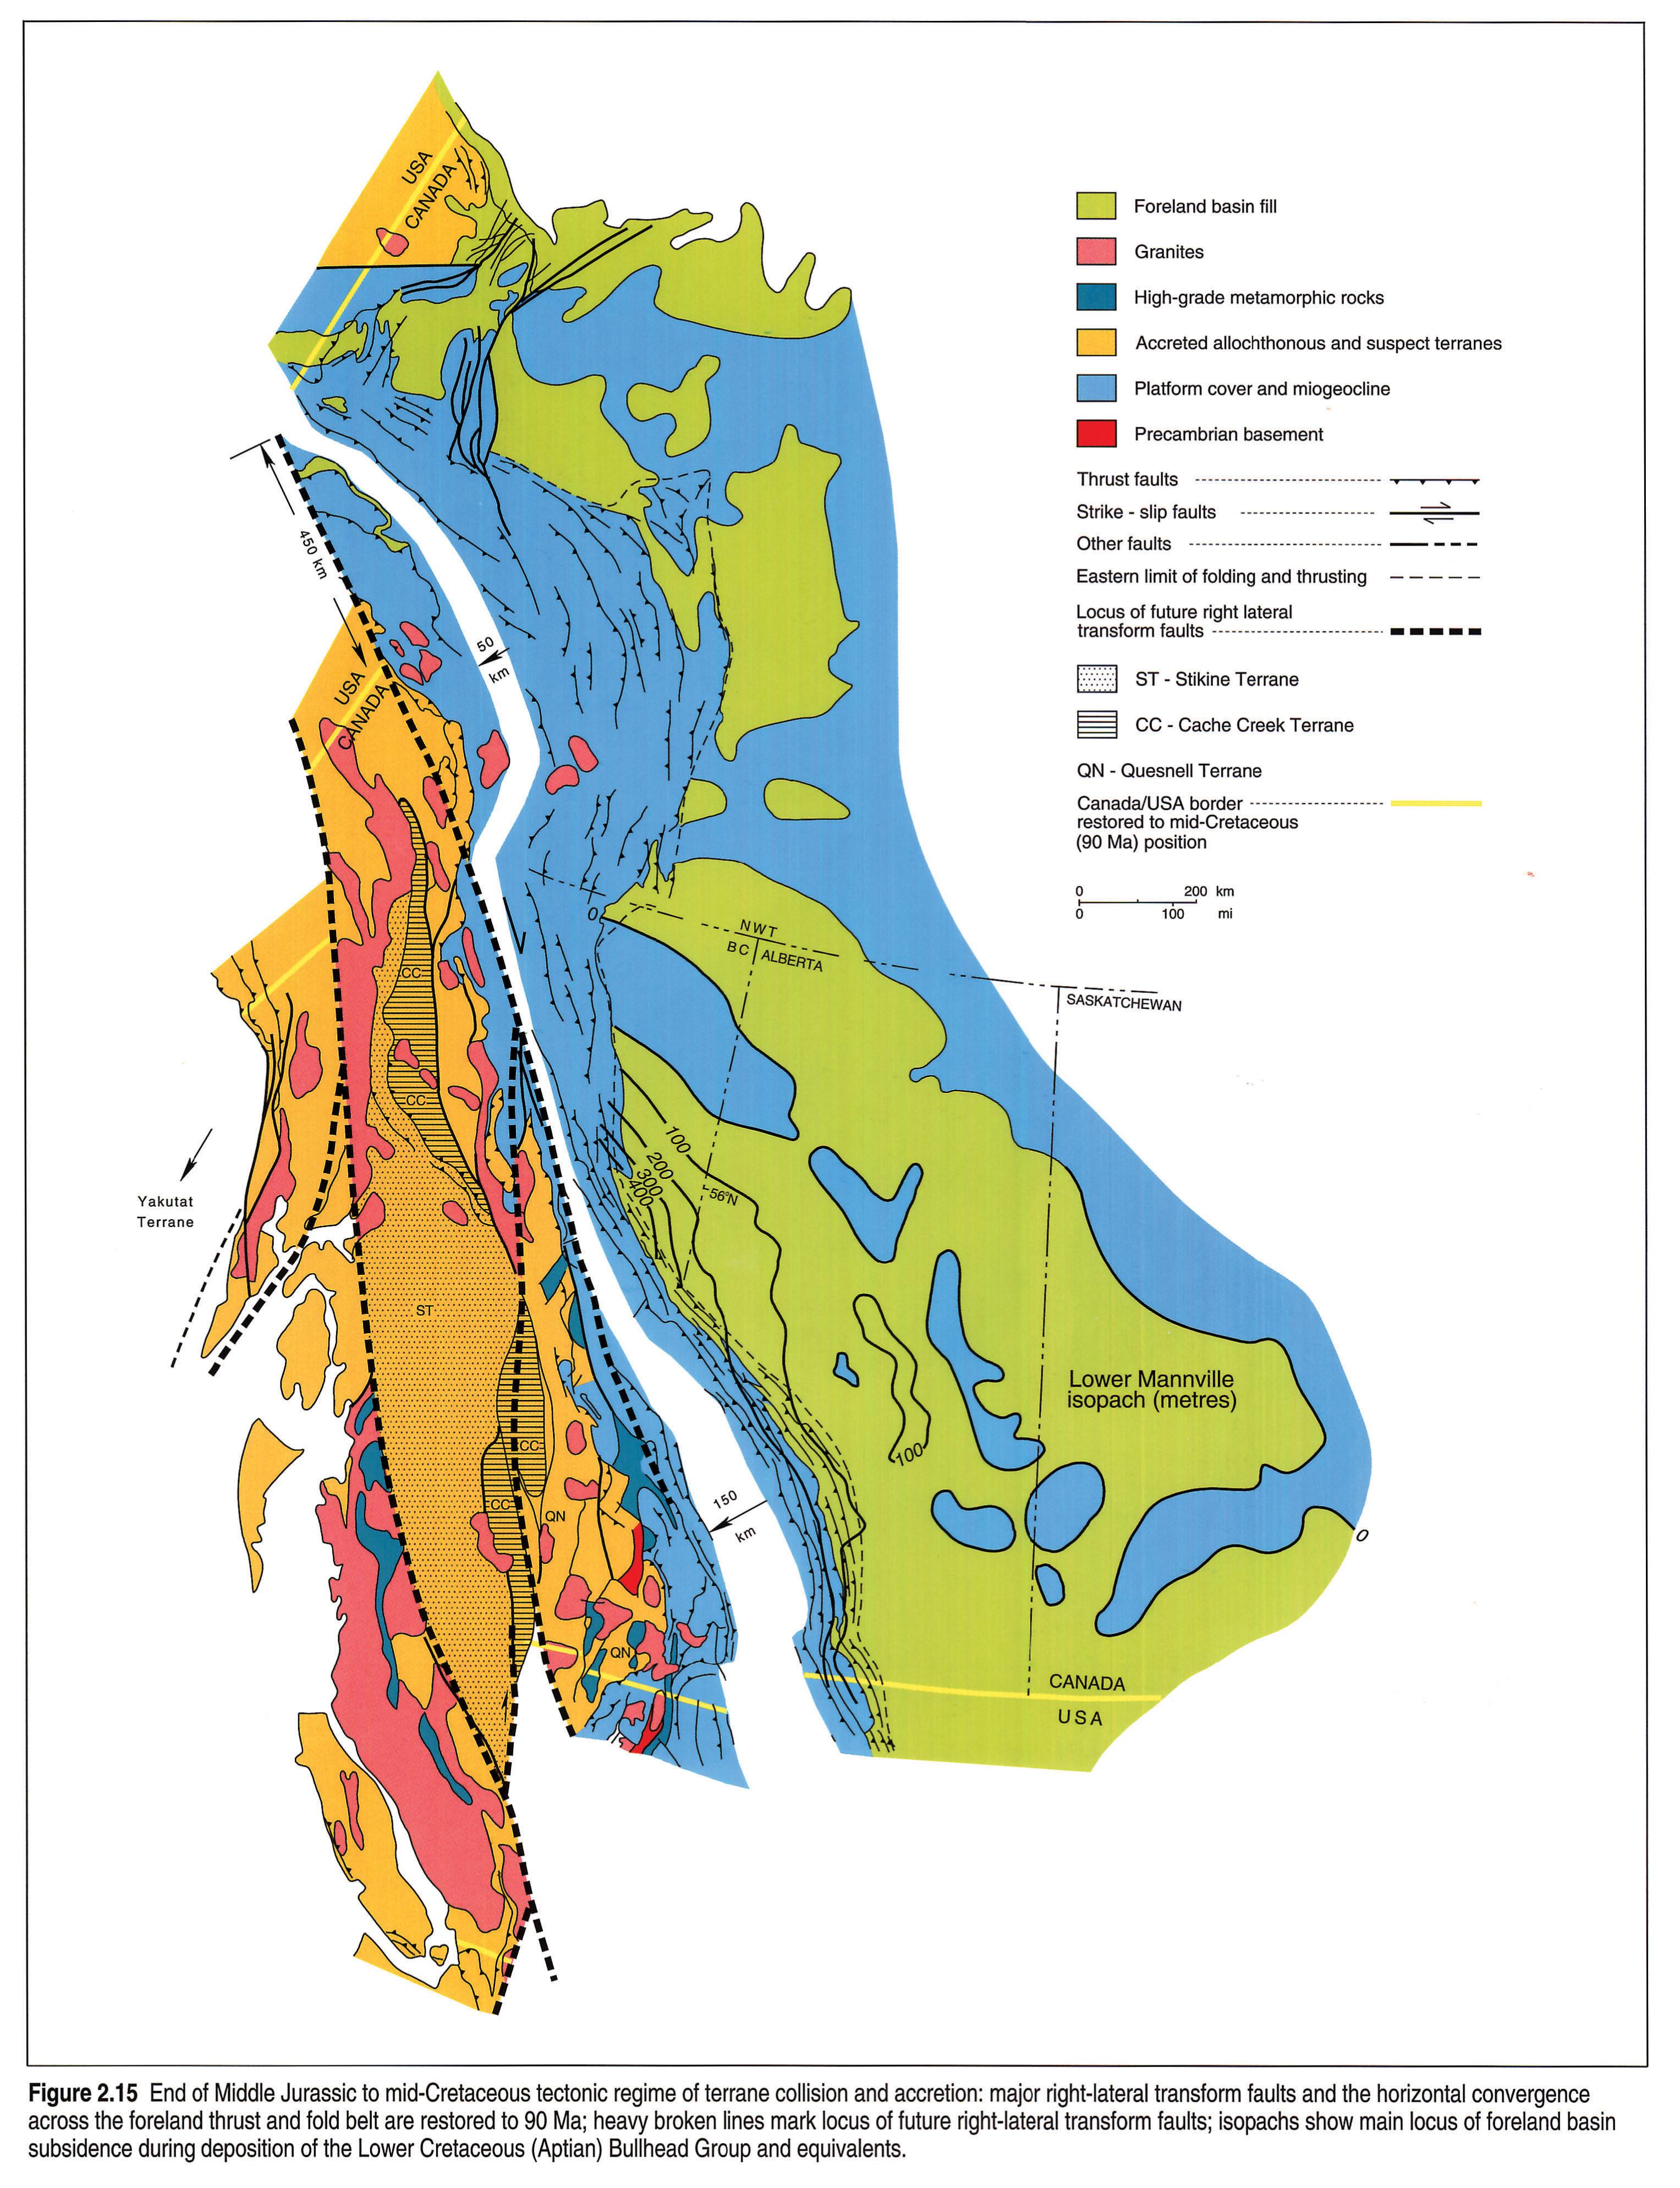 Chapter 2 - Cordilleran Tectonics